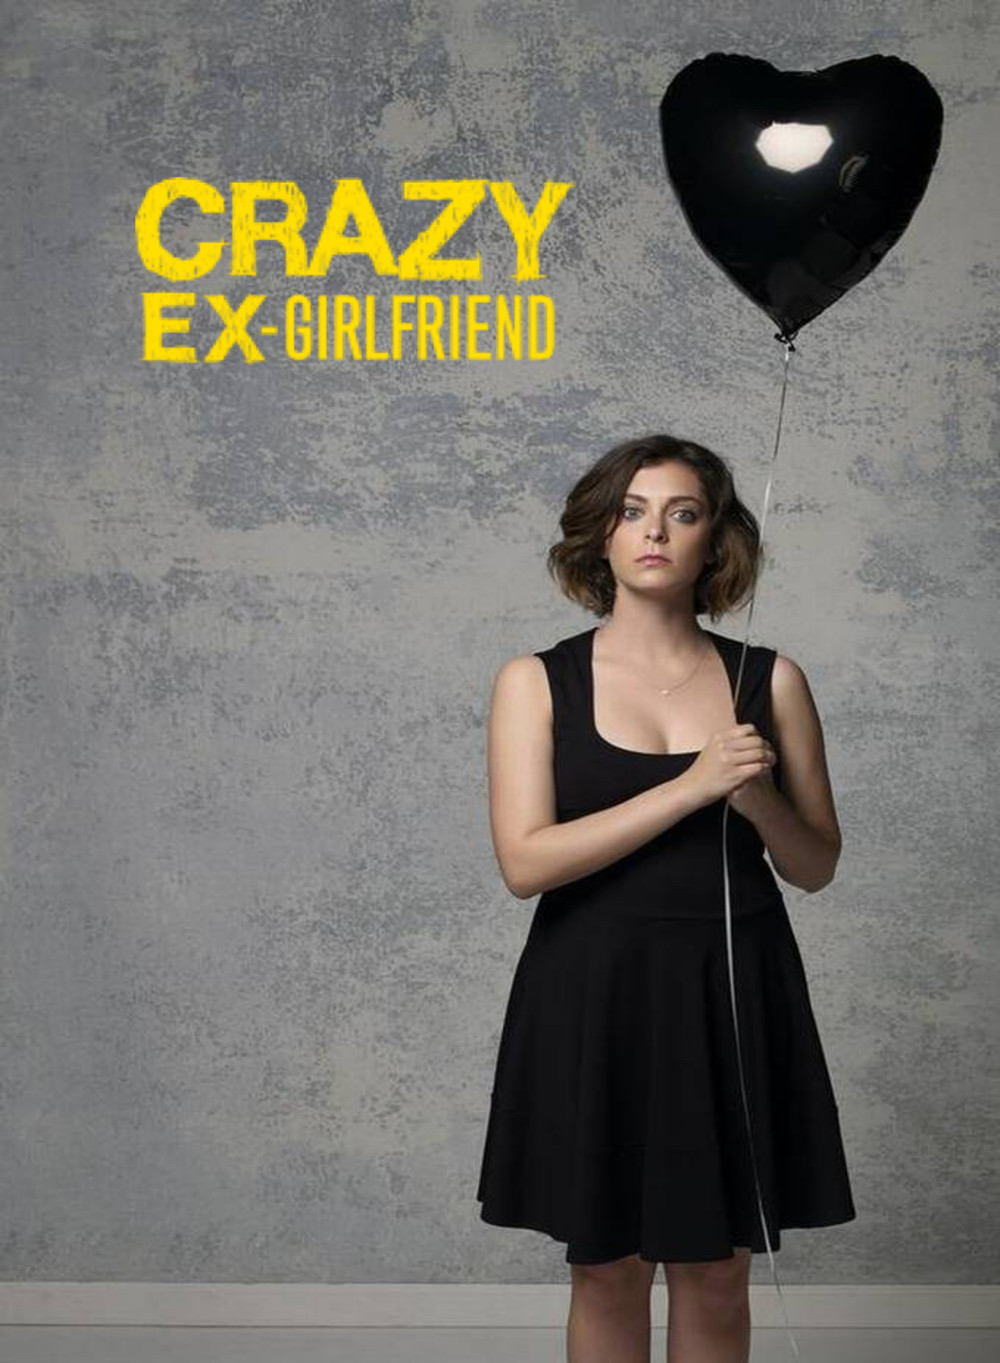 Crazy_Ex_Girlfriend-série.jpg